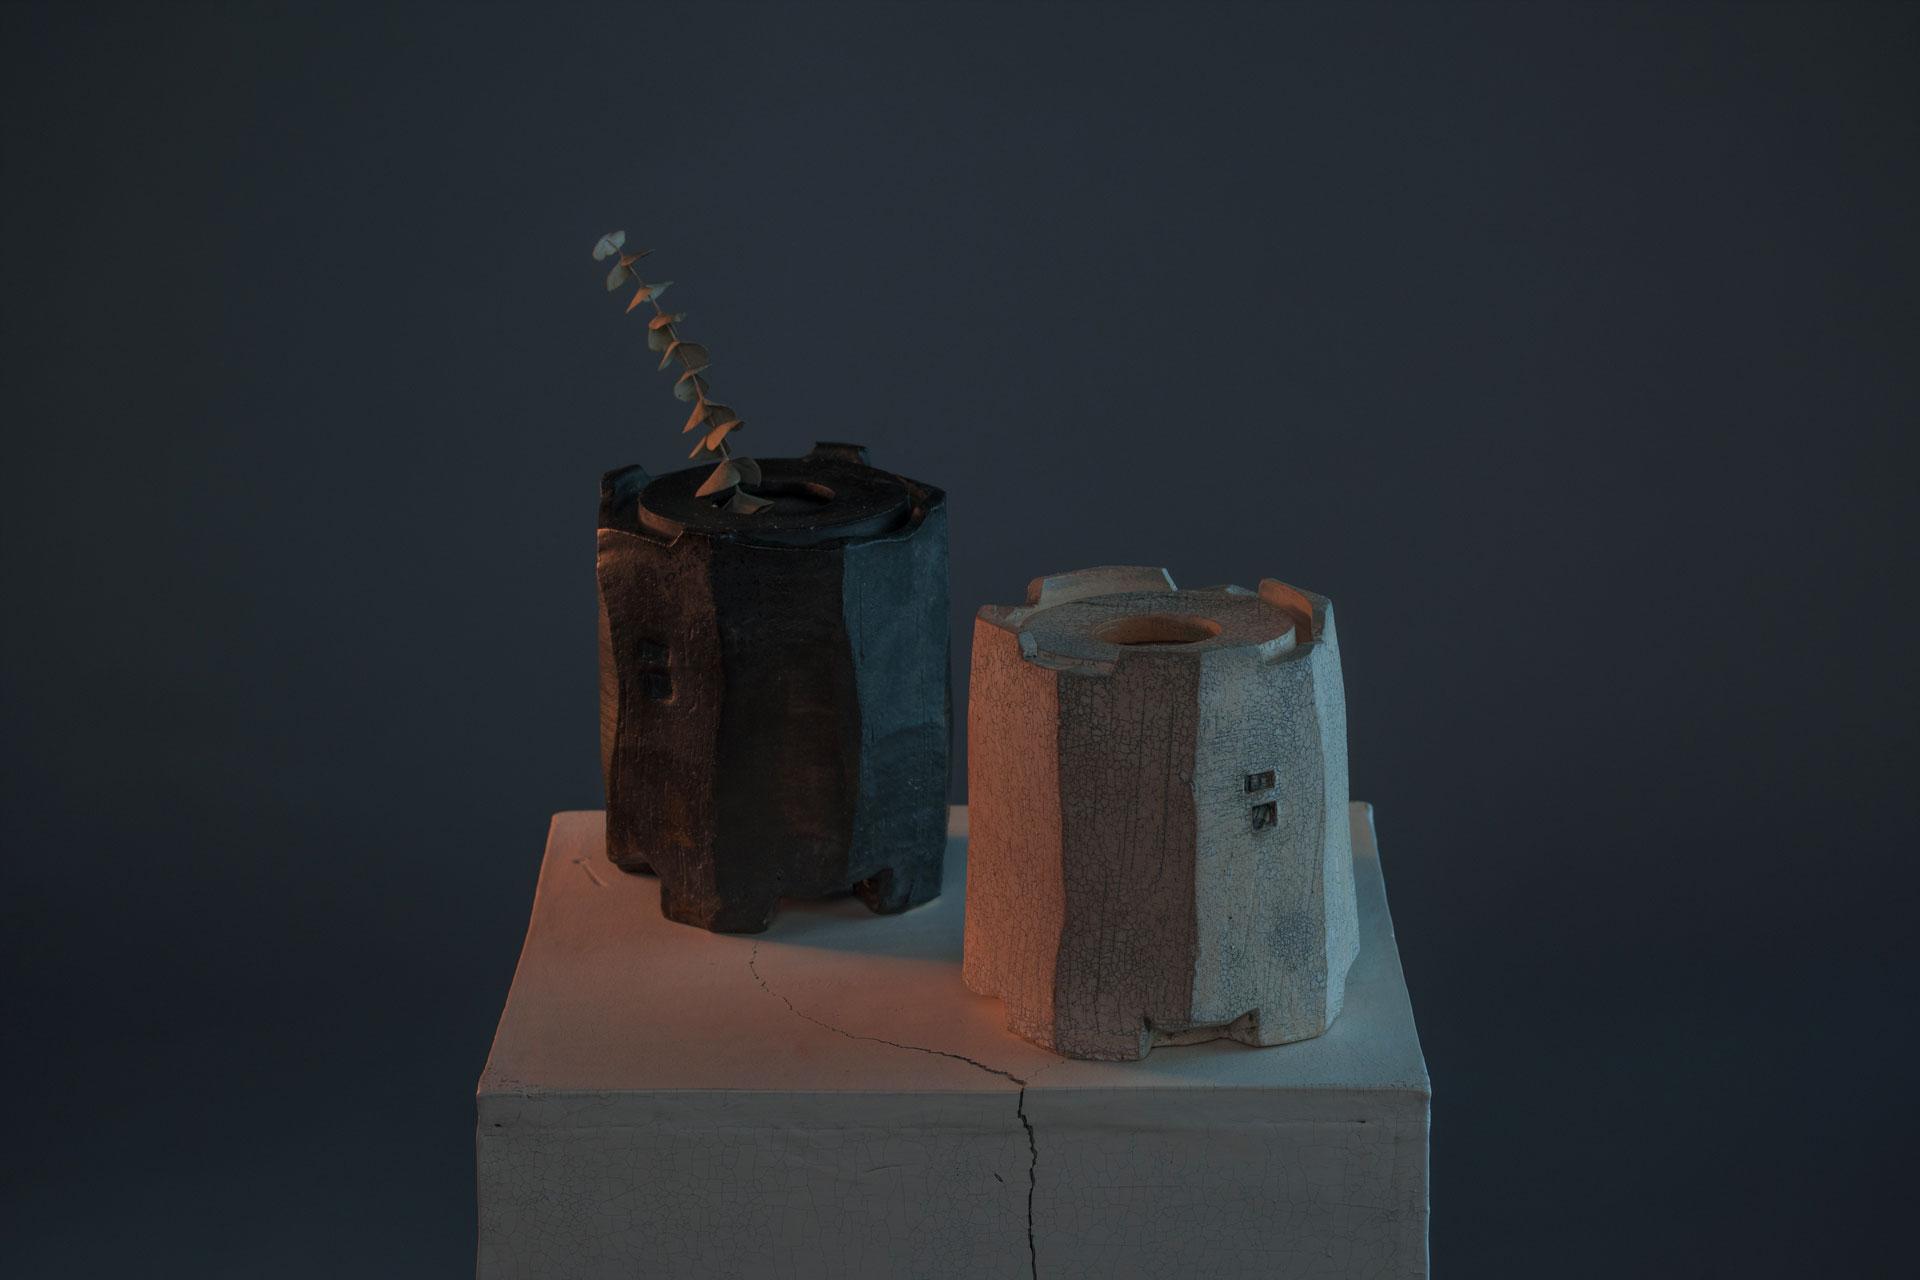 gallery-101-seung-jun-seo-ceramics-artist-asheville-north-carolina-7.jpg